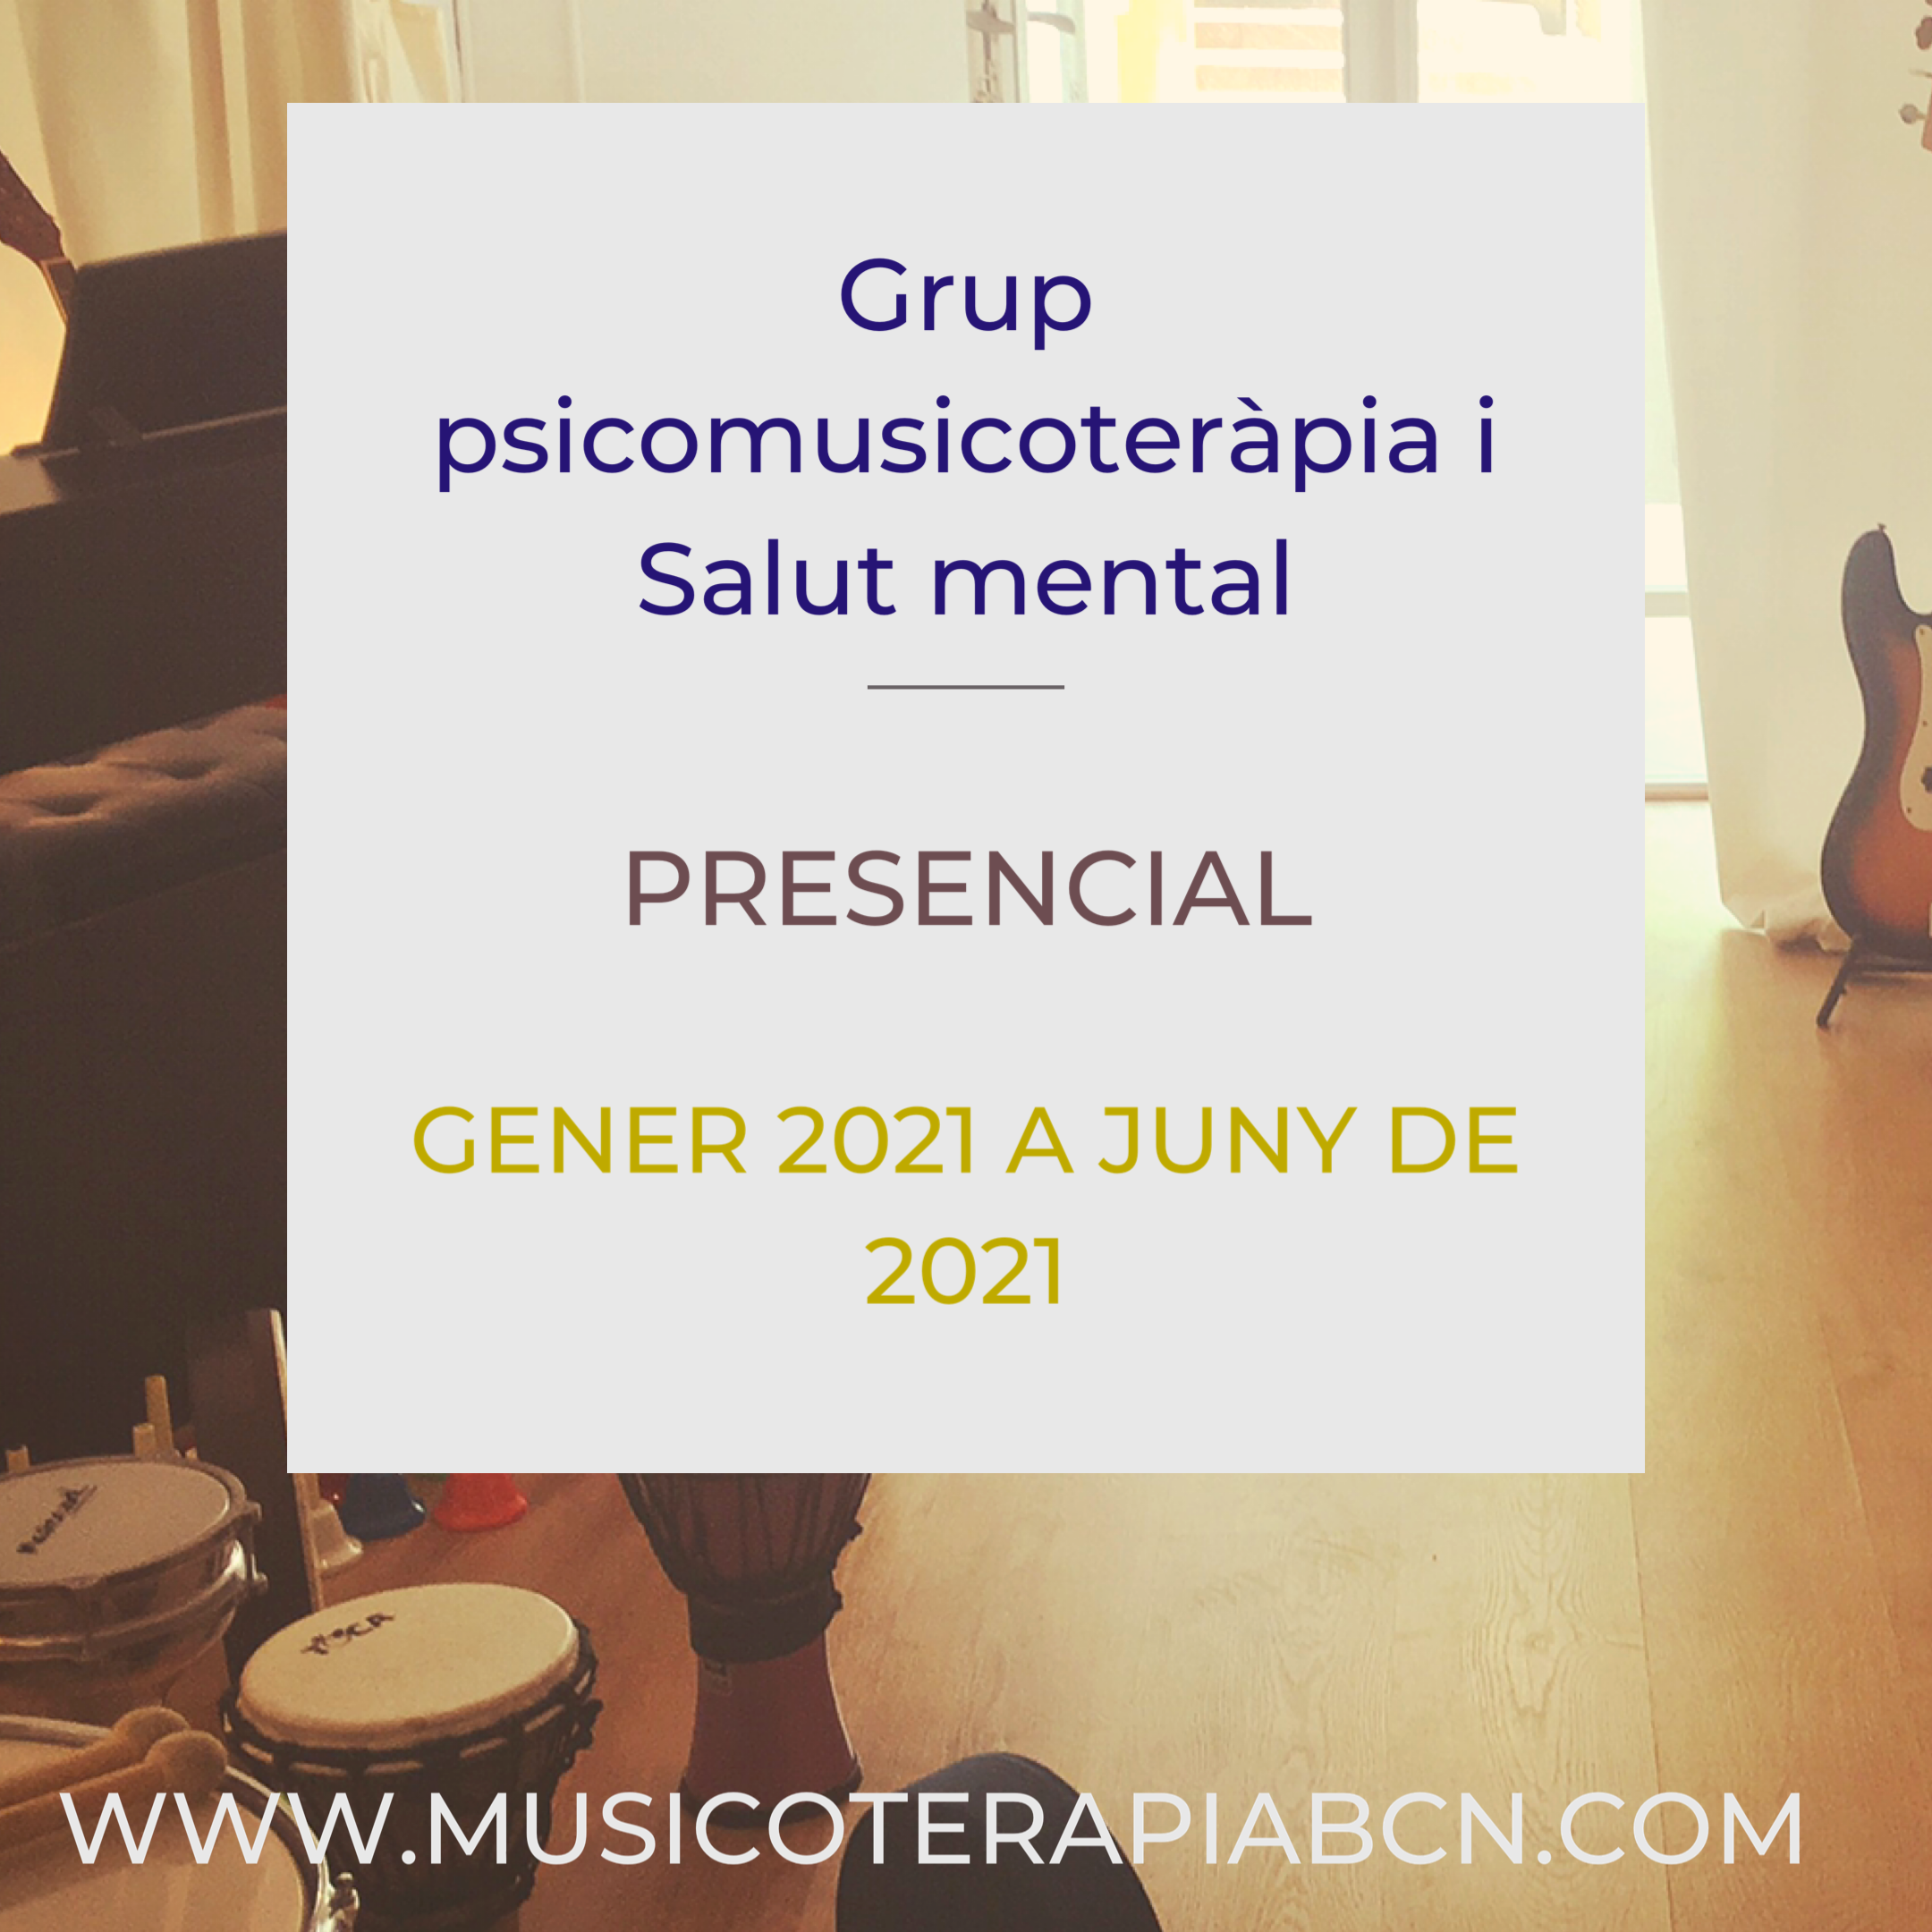 Musicoterapia salud mental